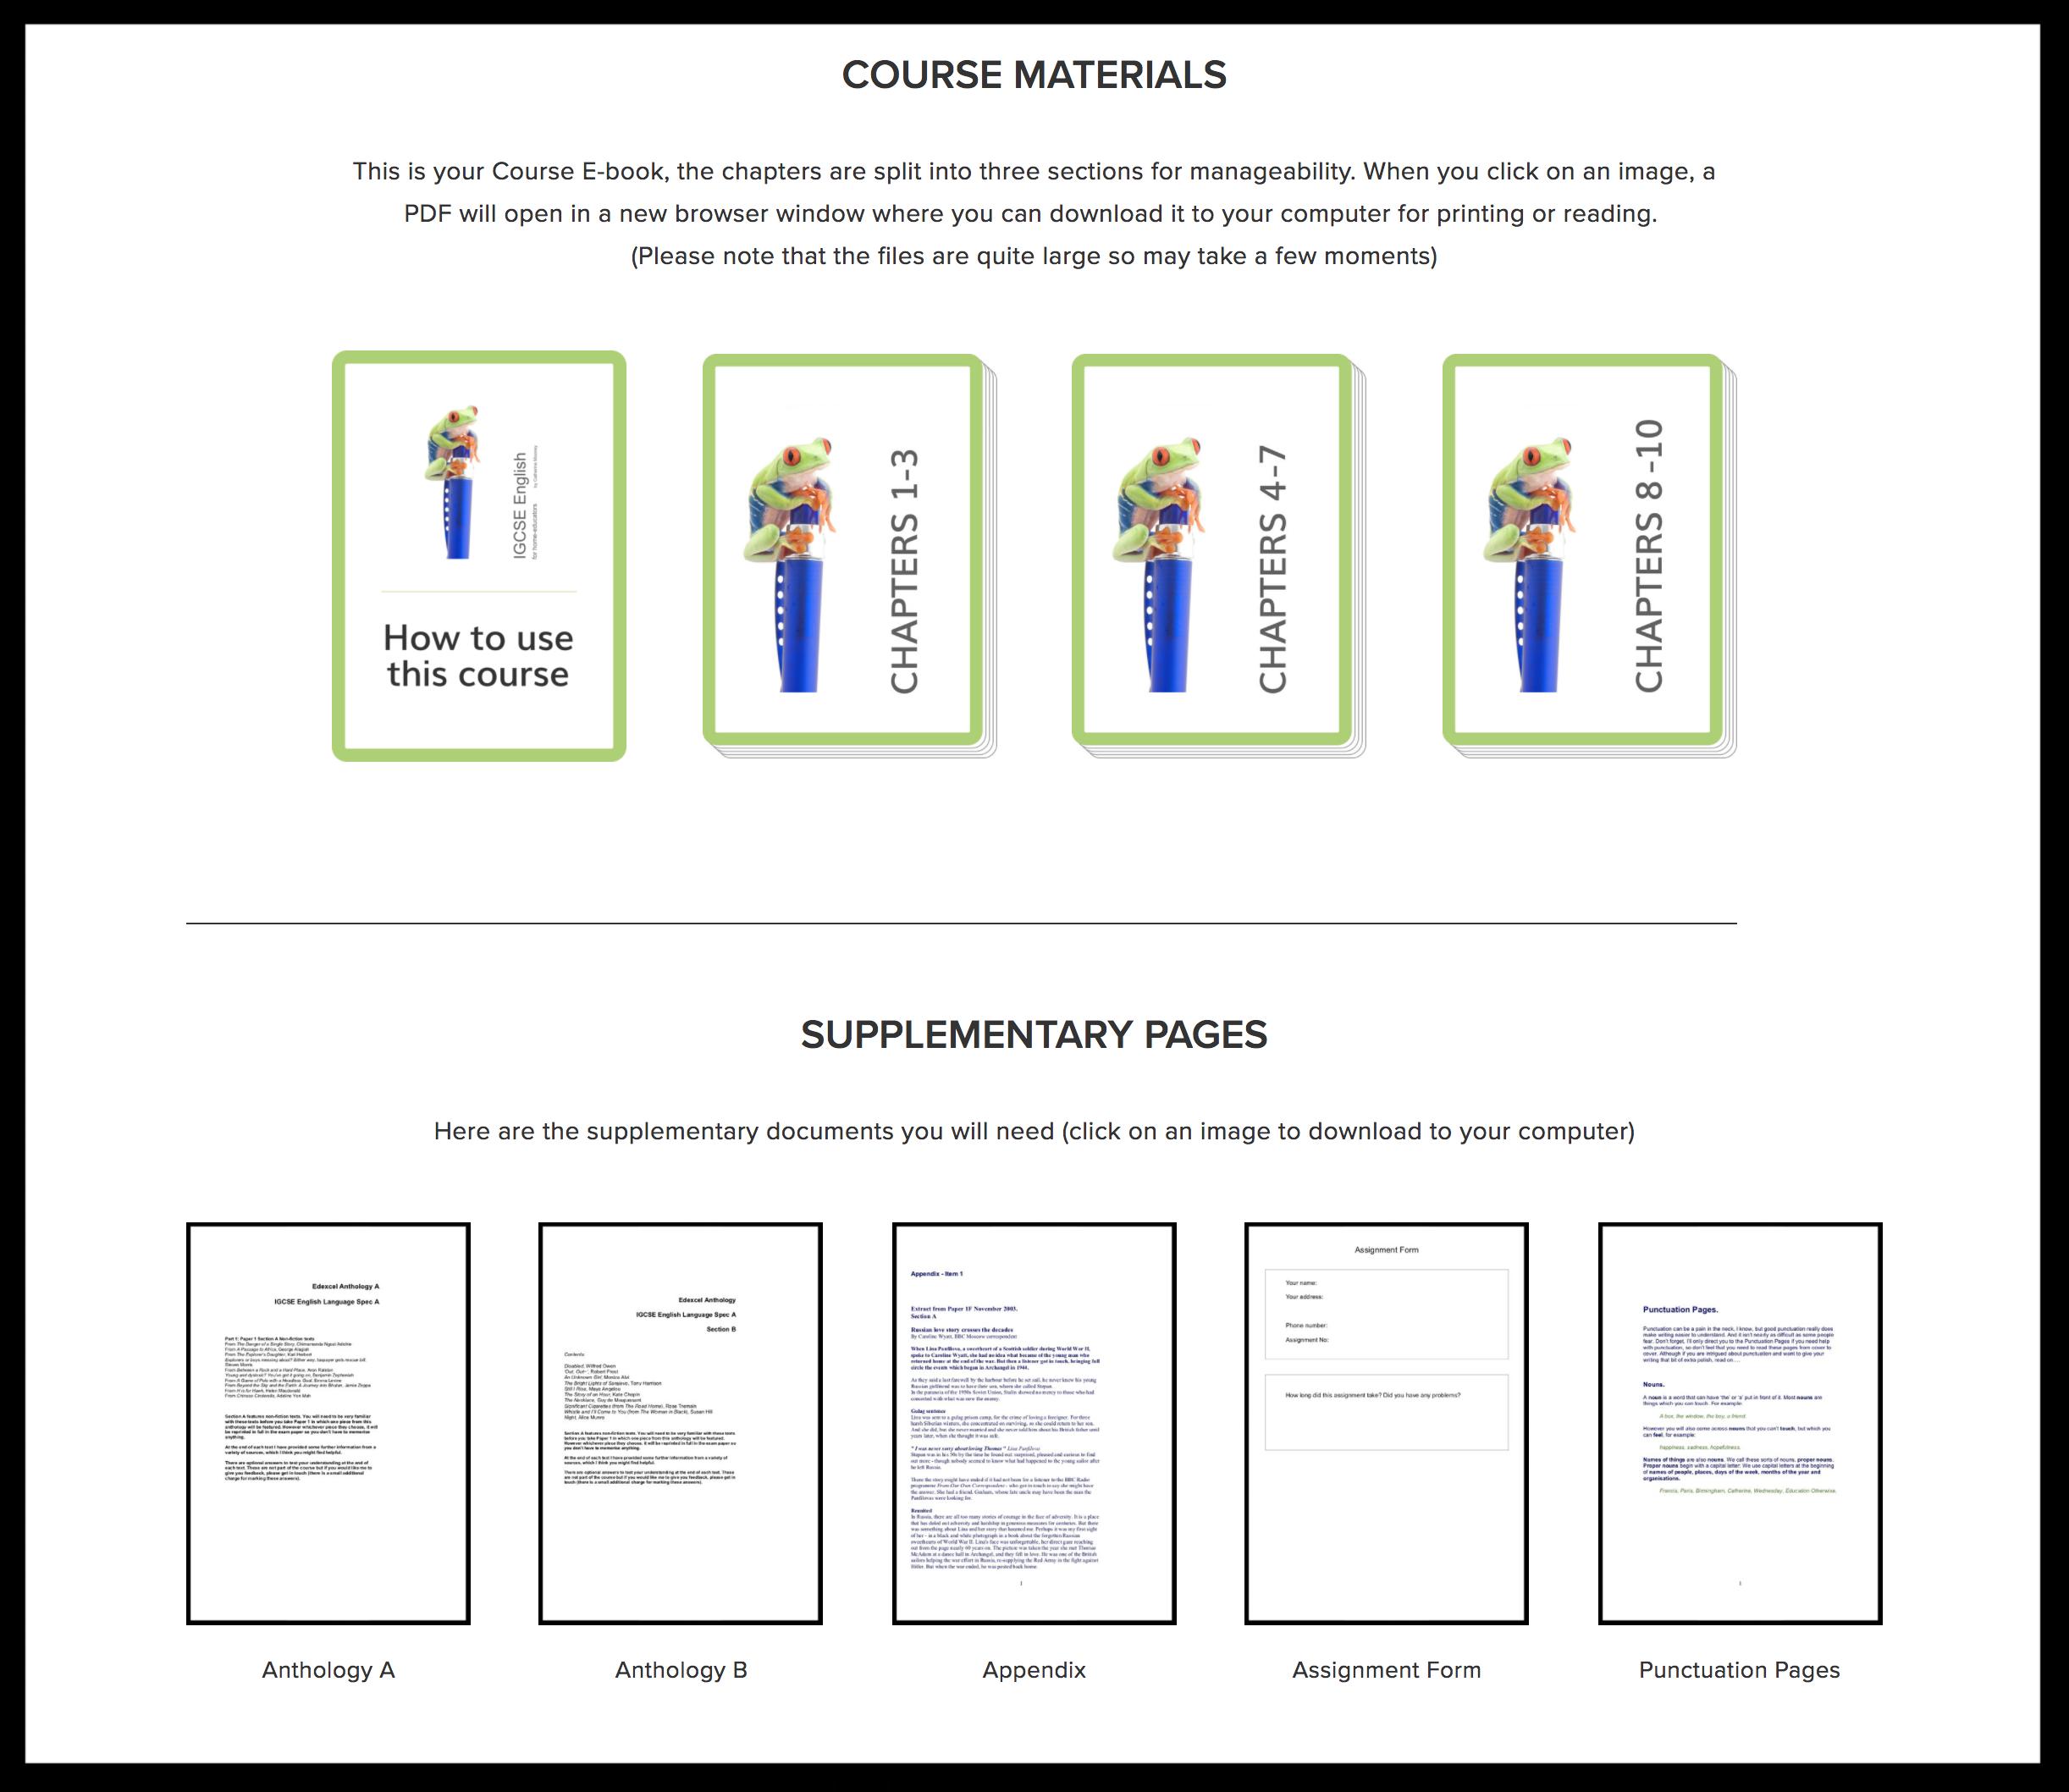 screencapture-catherinemooneytutoring-squarespace-login-igcse-english-language-spec-a-2018-03-27-09_39_01 copy 2.png